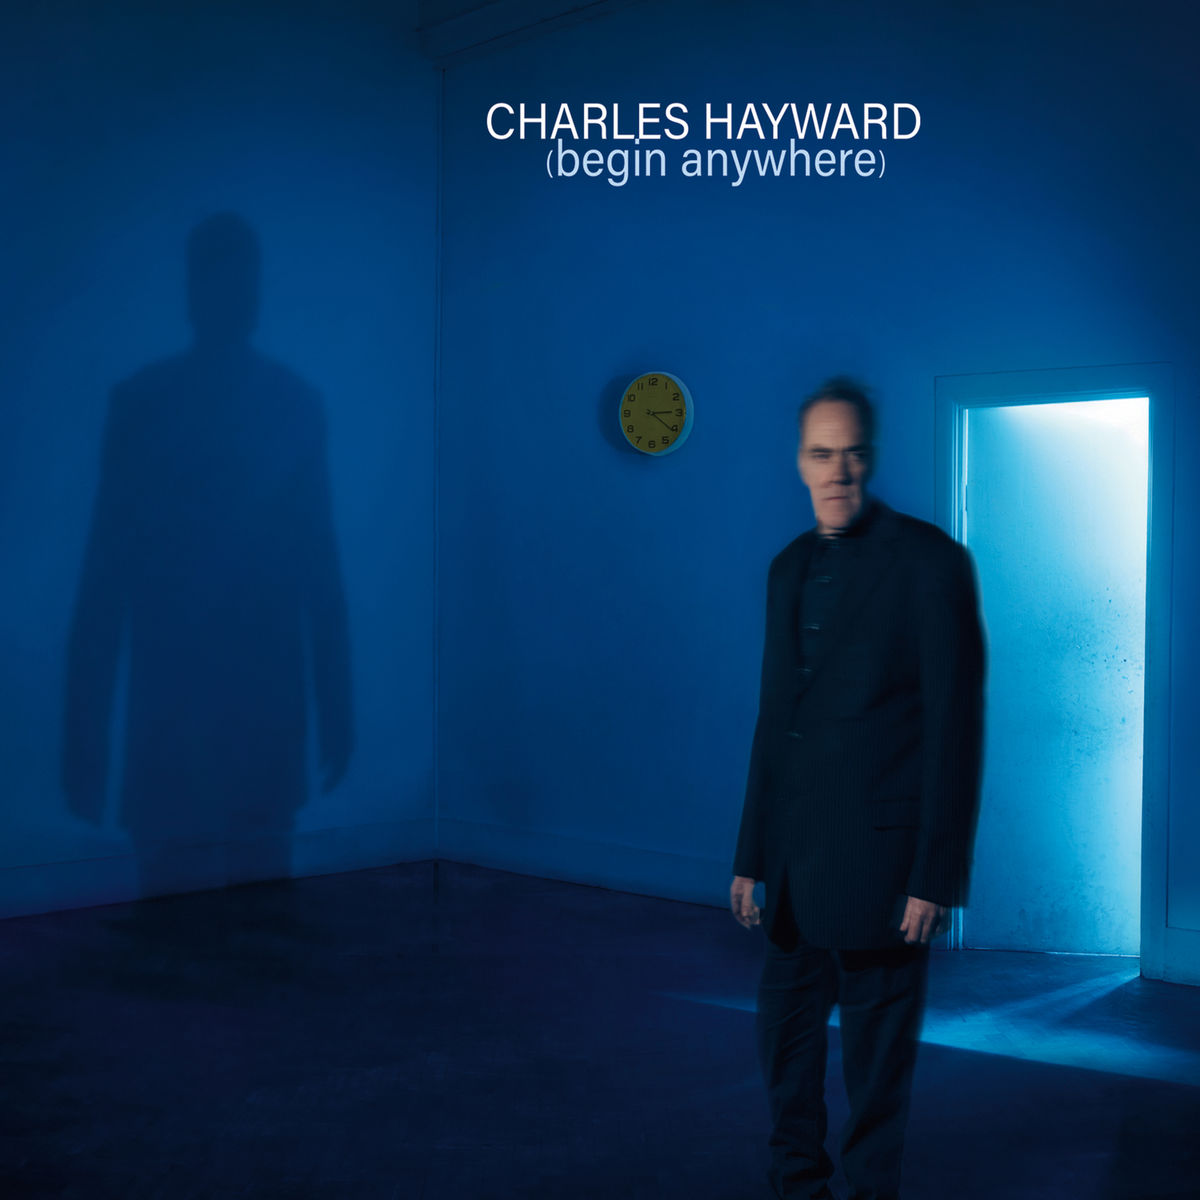 Charles Hayward - (Begin Anywhere) (2019)